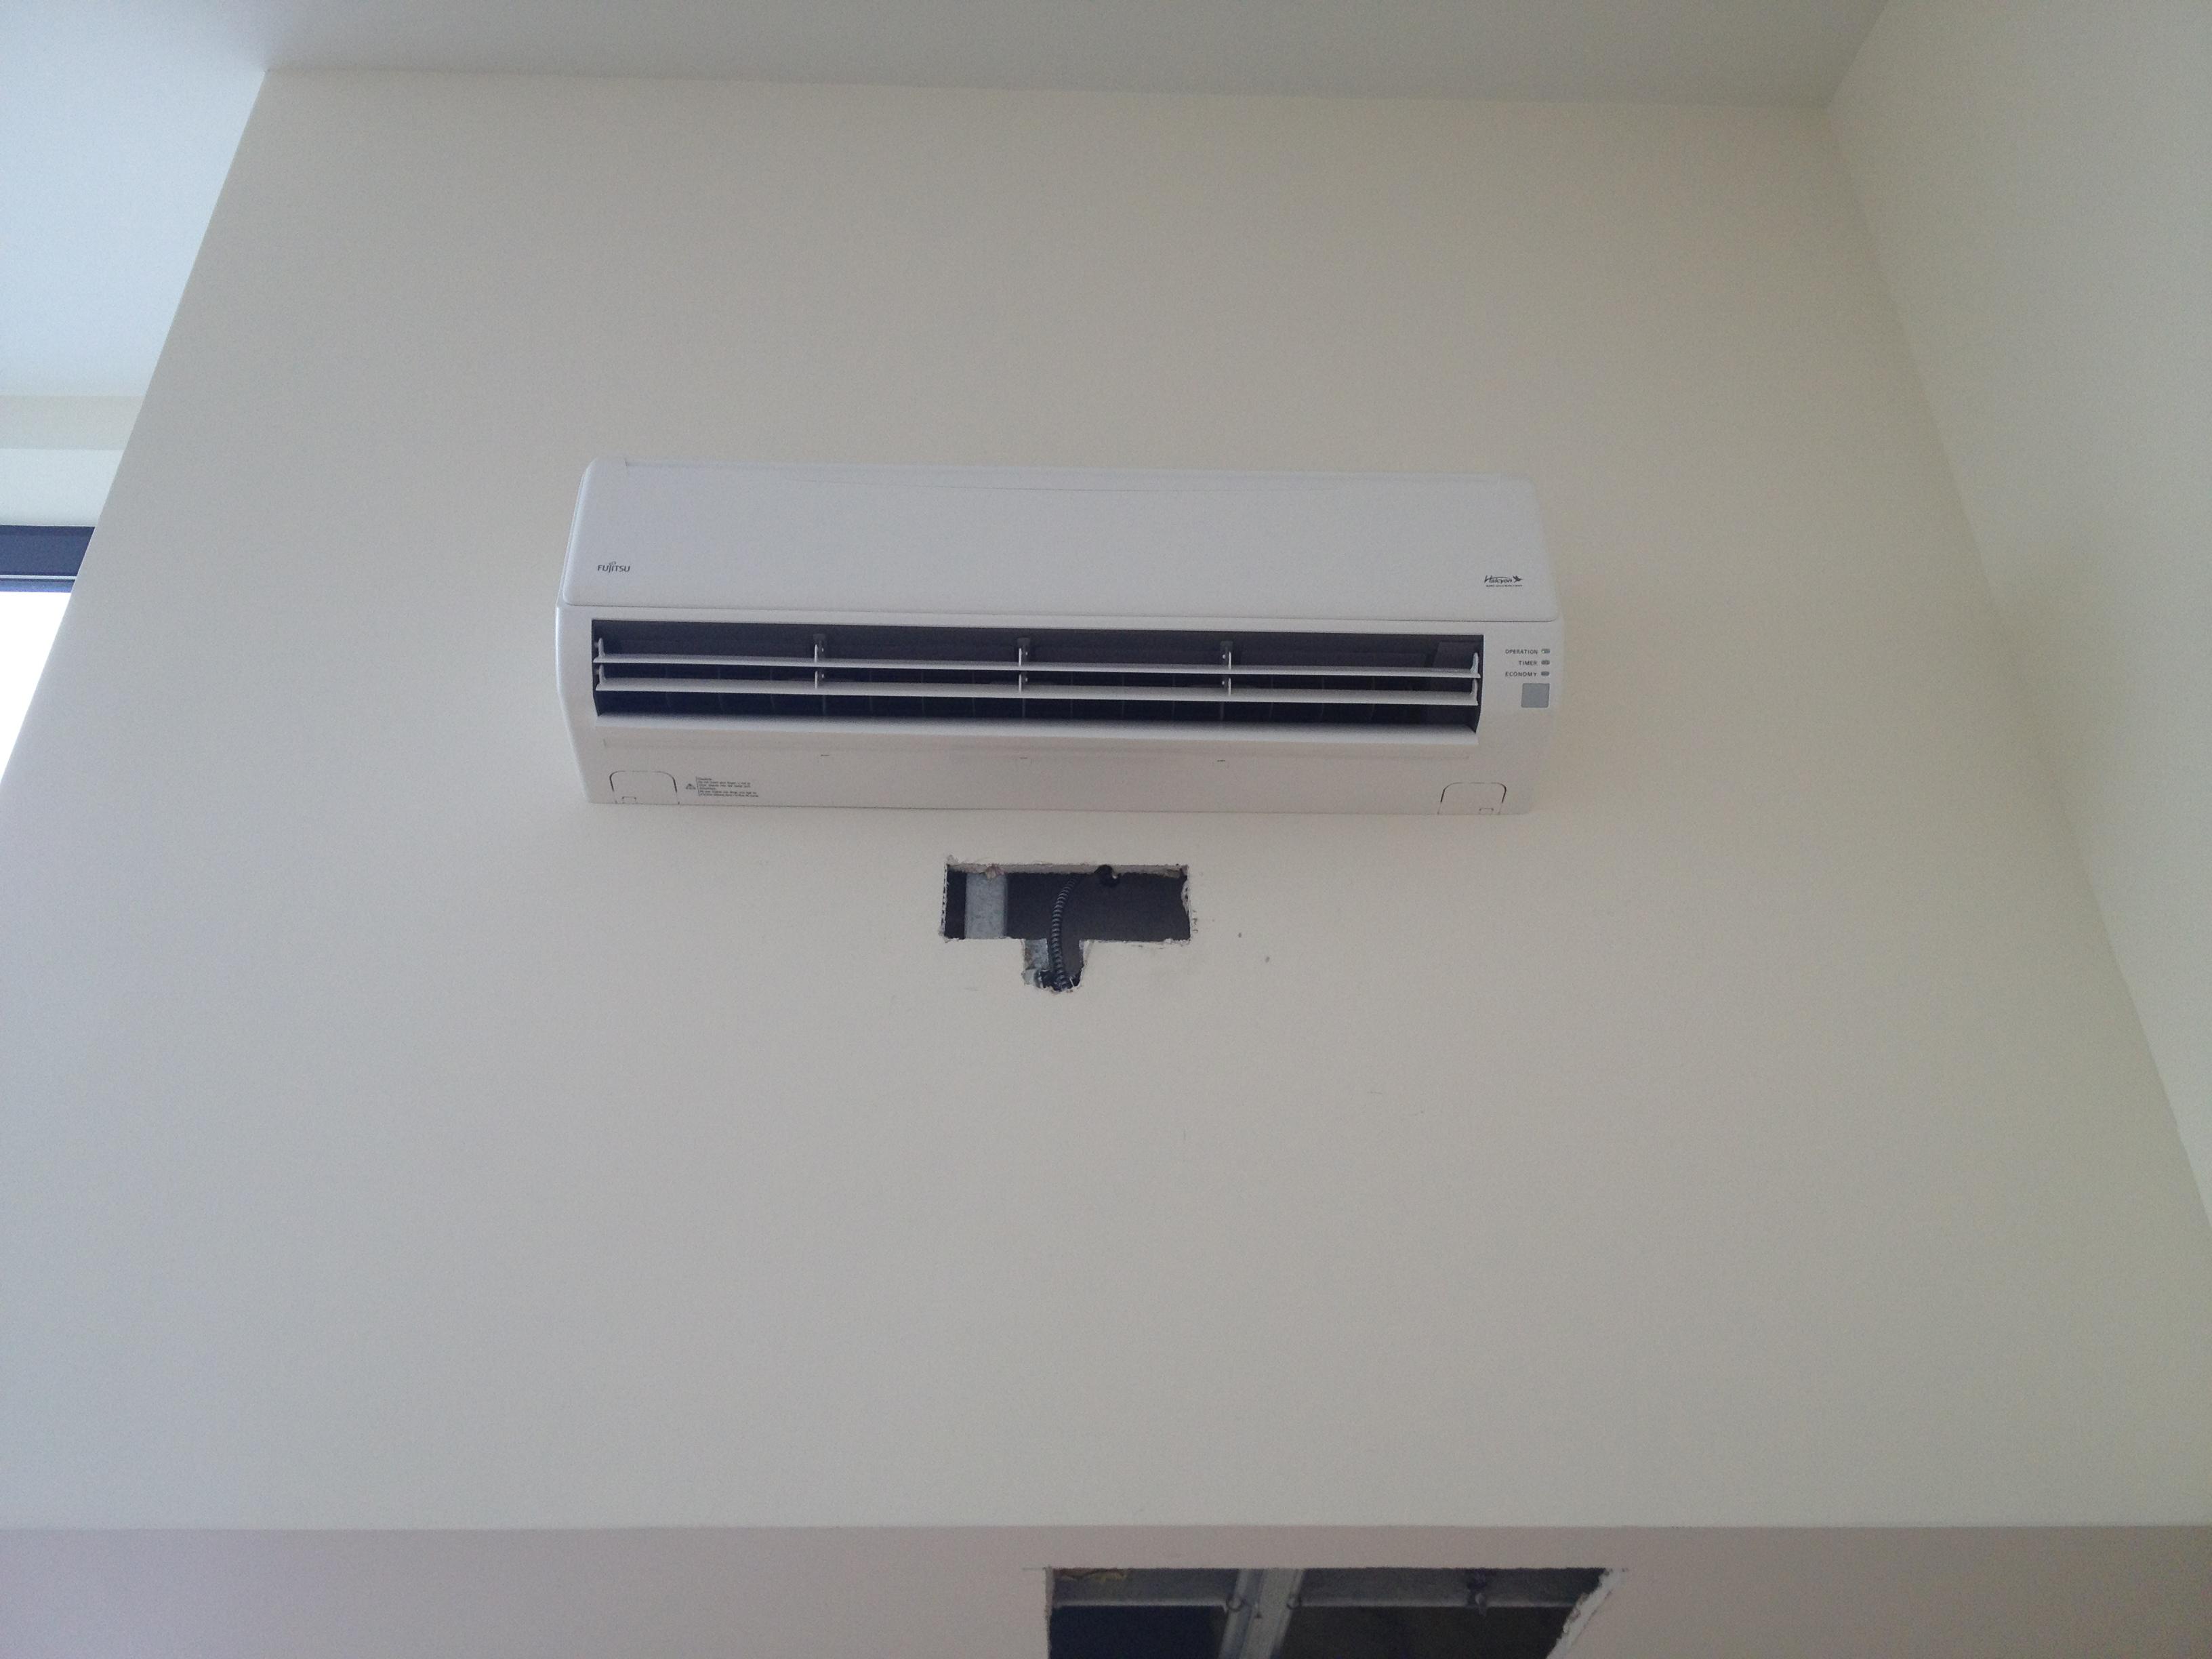 Mini split FTX18LVJU / RXS18LVJU 18 000 Btu include HVAC installation #262832